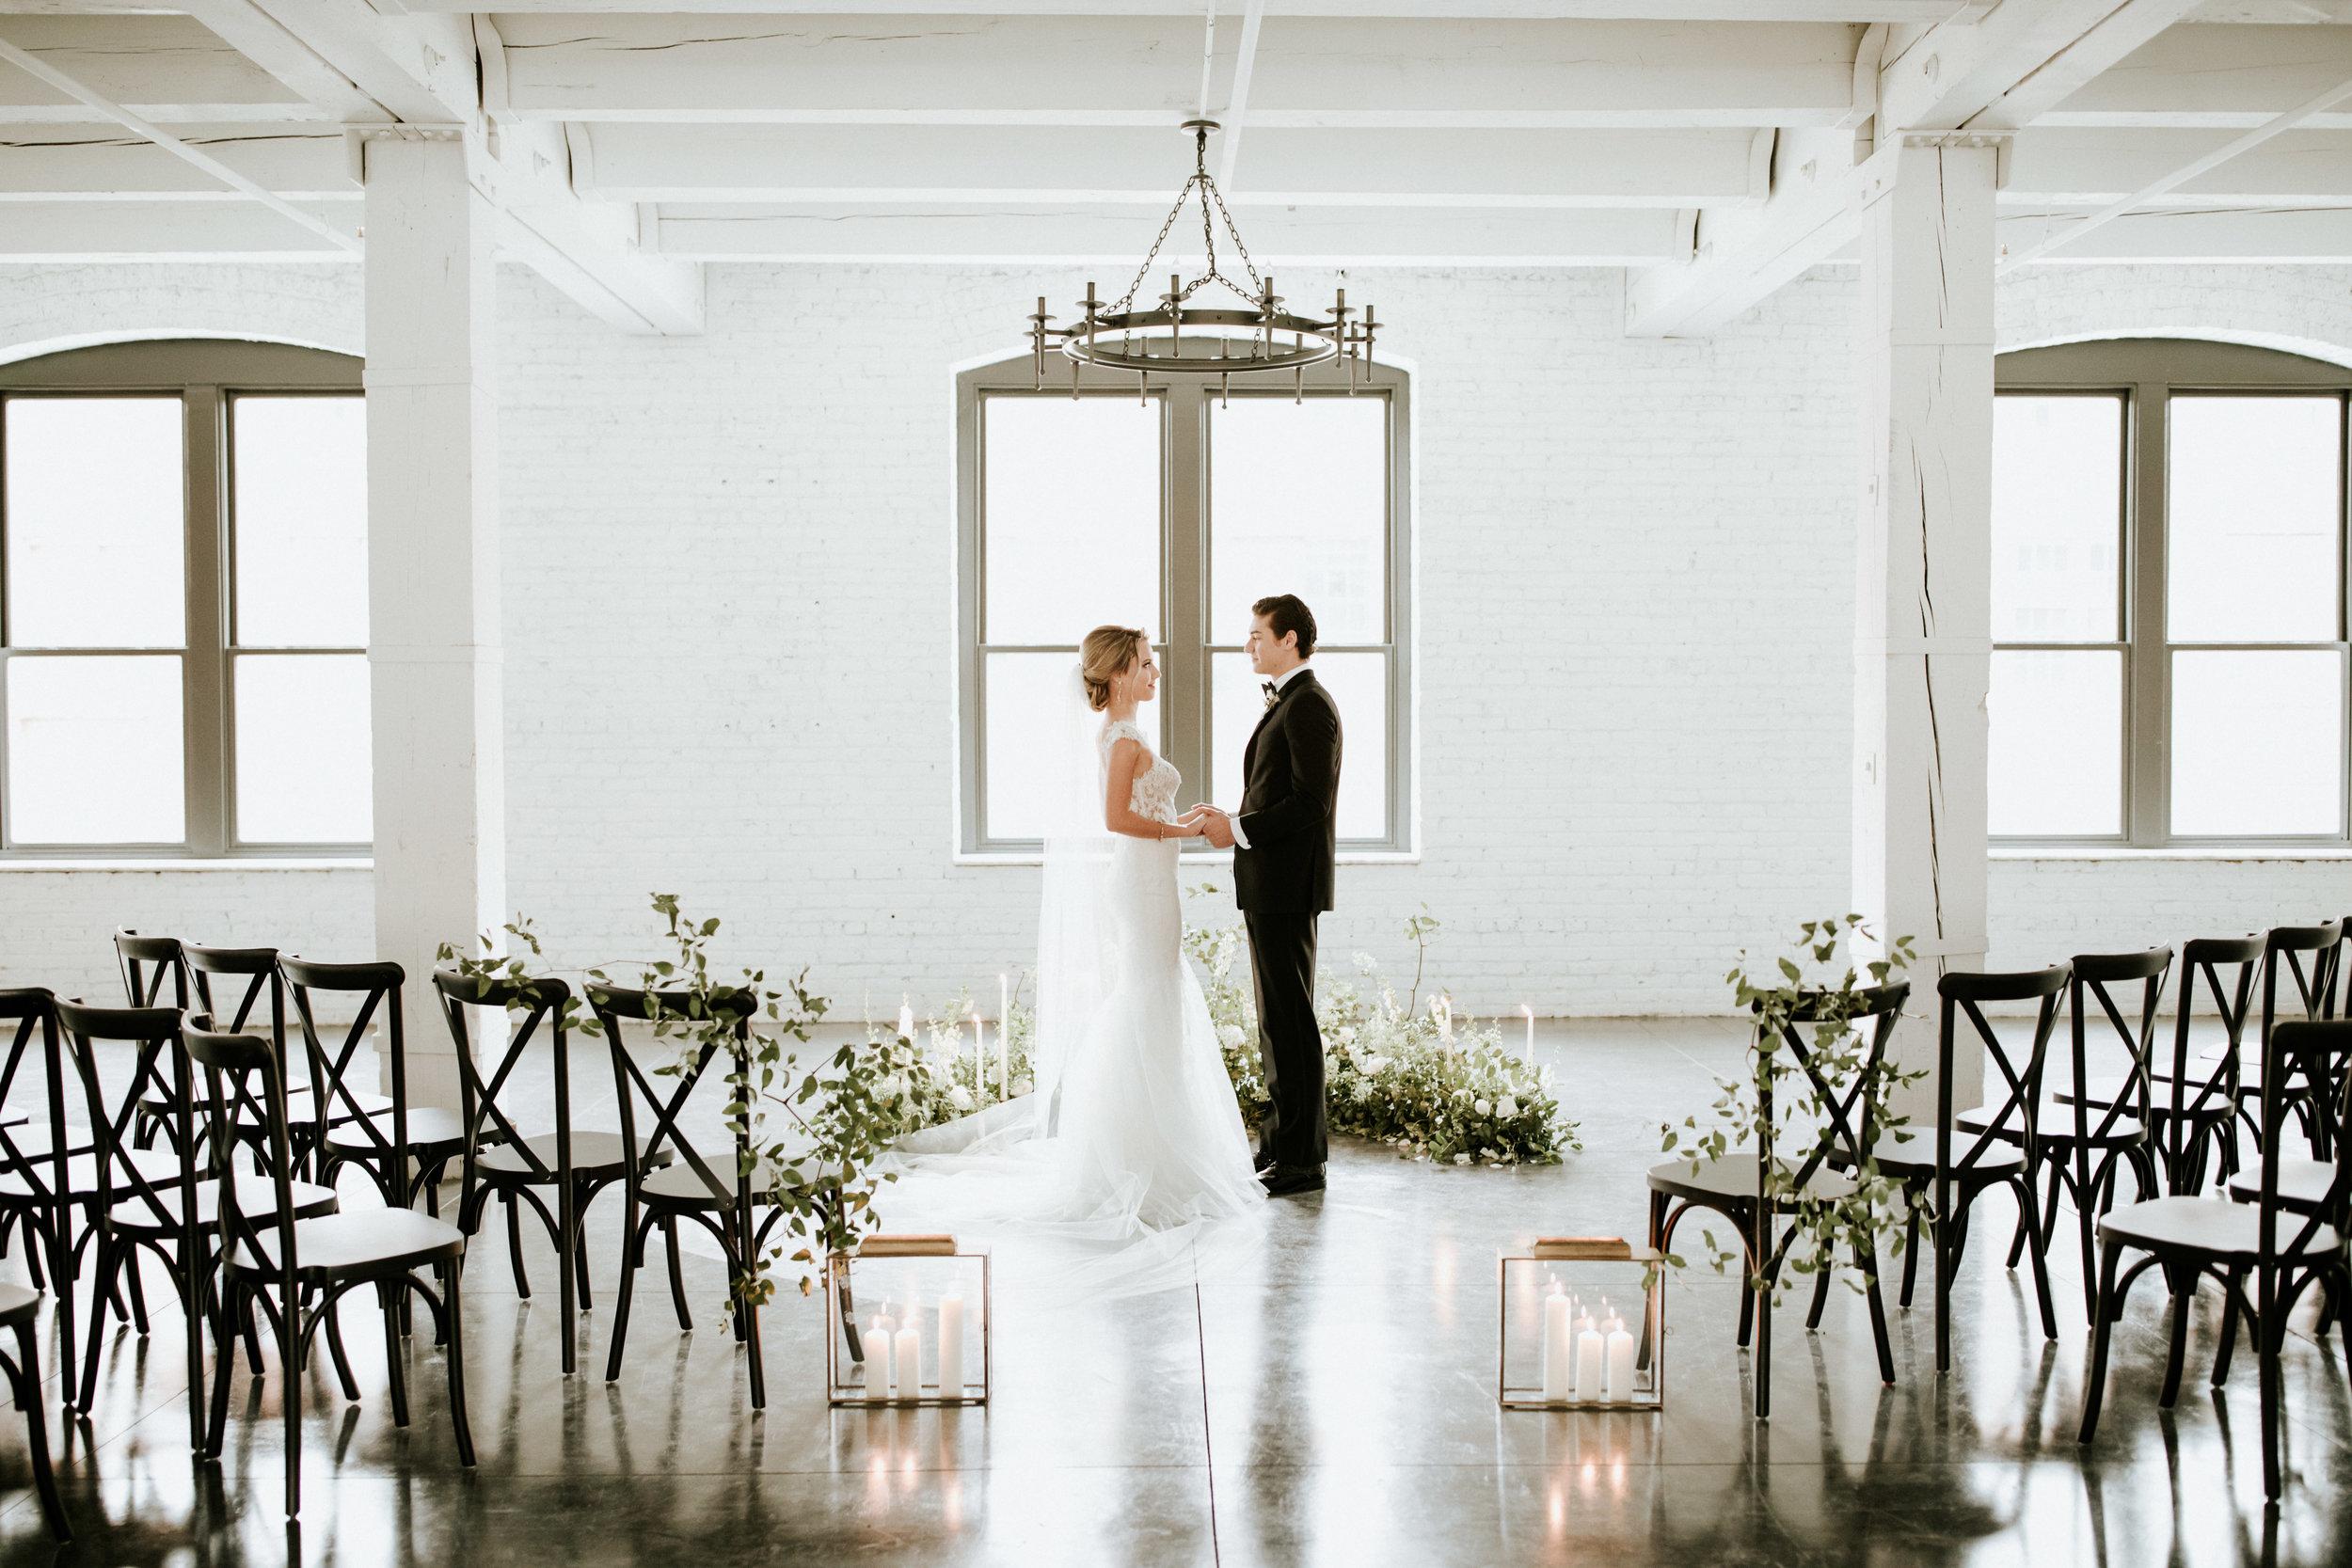 company-251-wedding-shoot-full-resolution-109.jpg